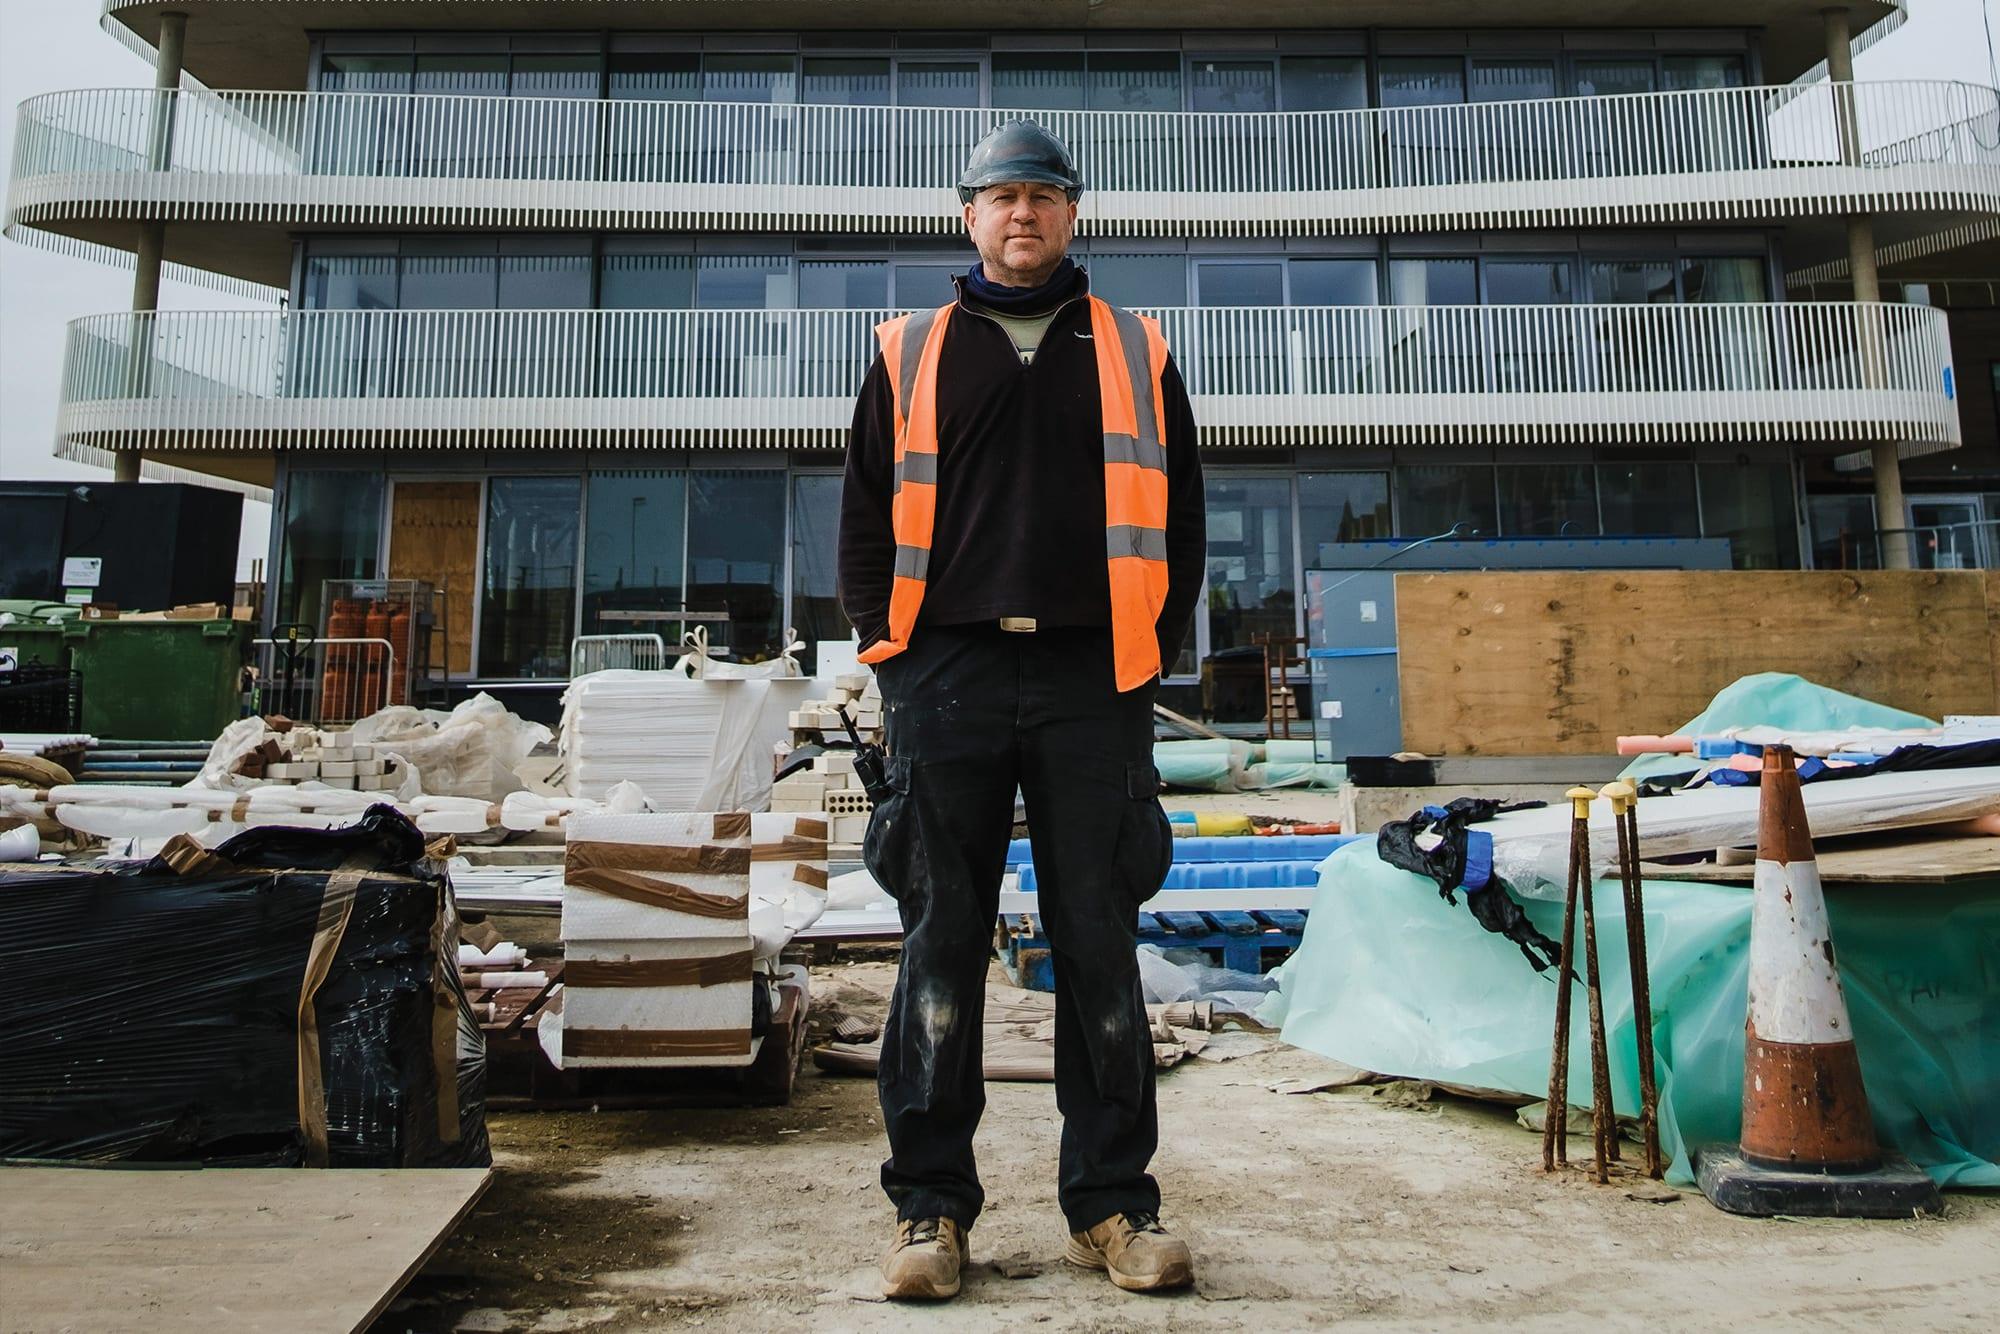 Adam - The Site Manager © Anja Poehlmann